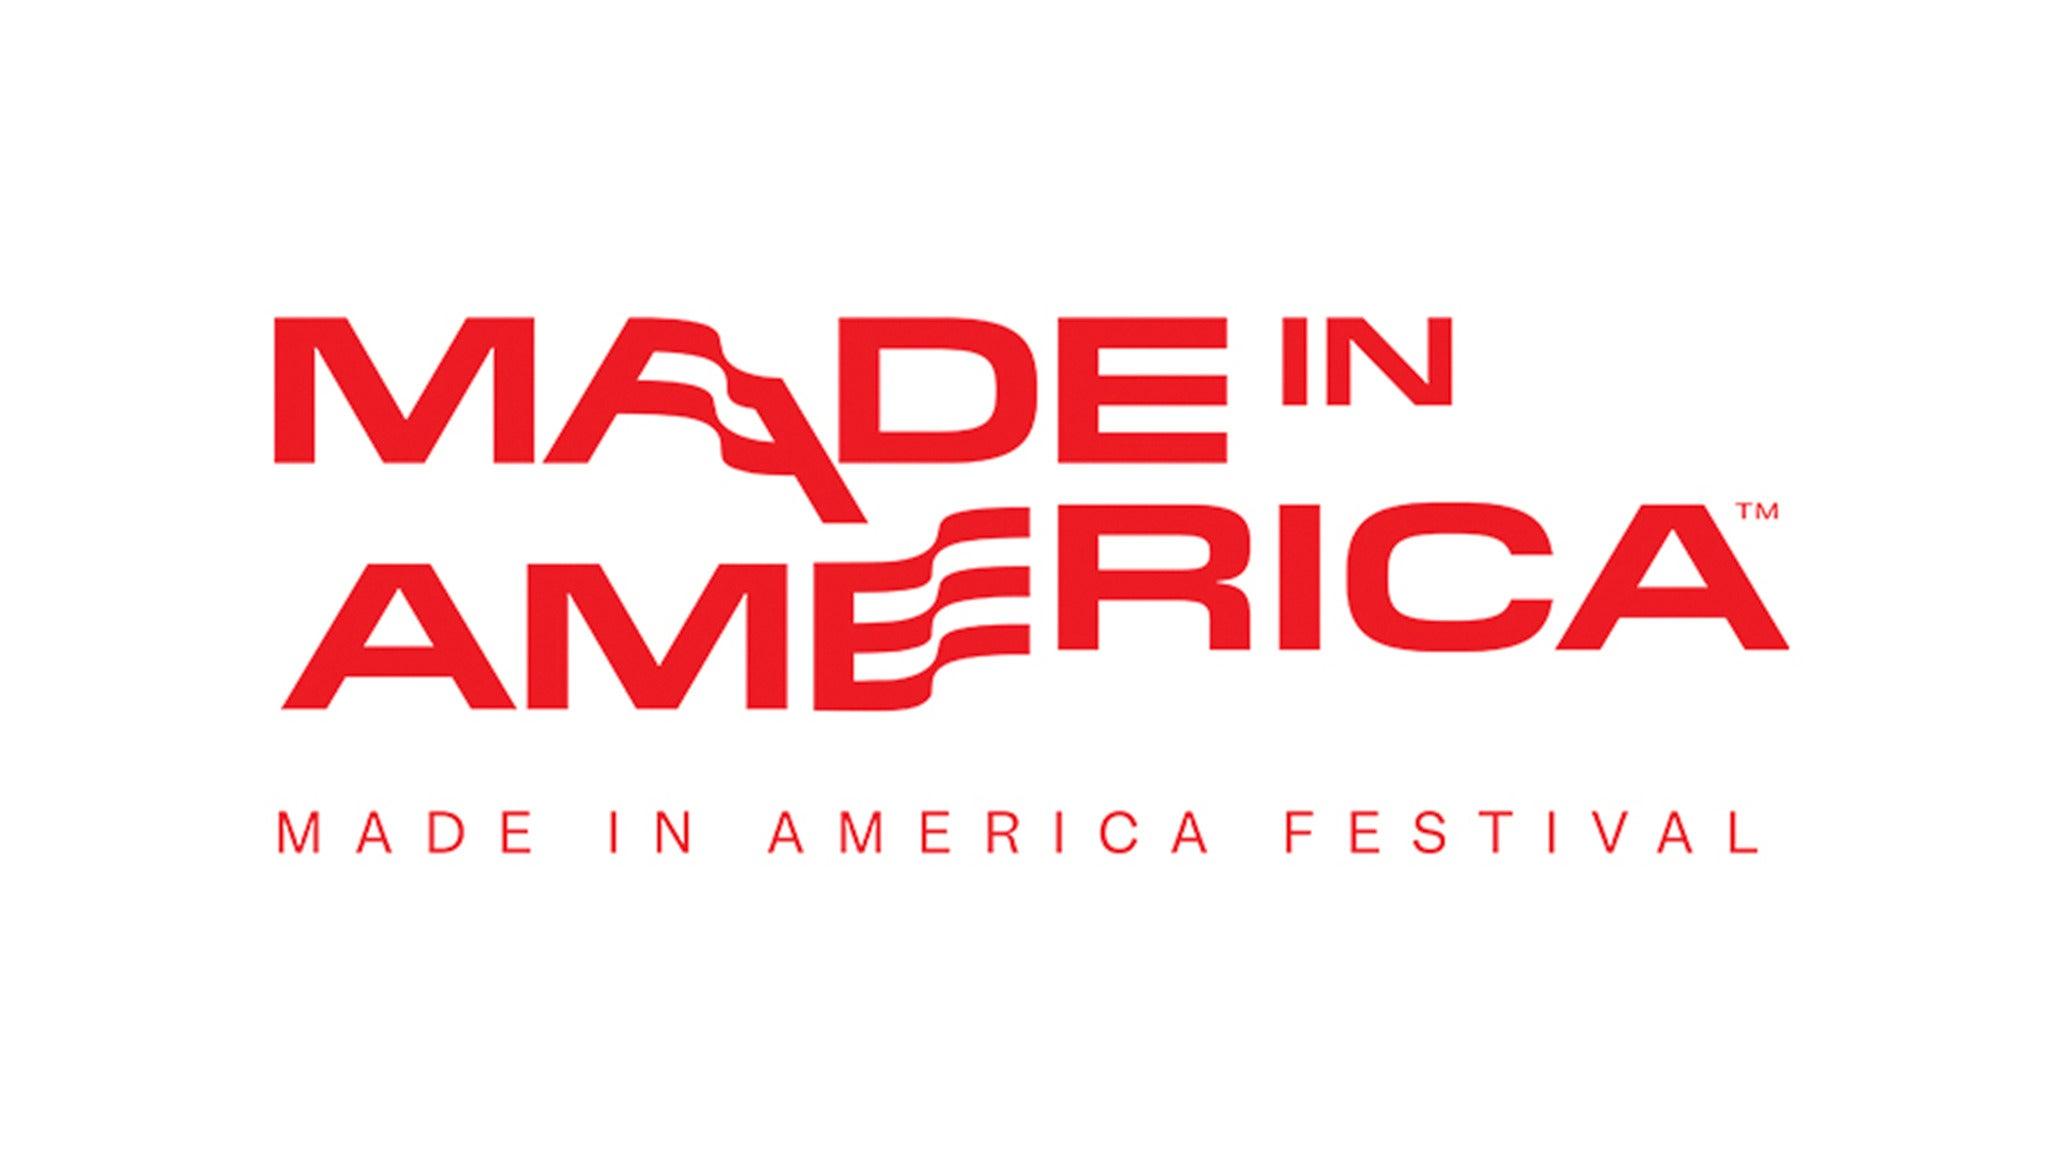 Made in America Festival